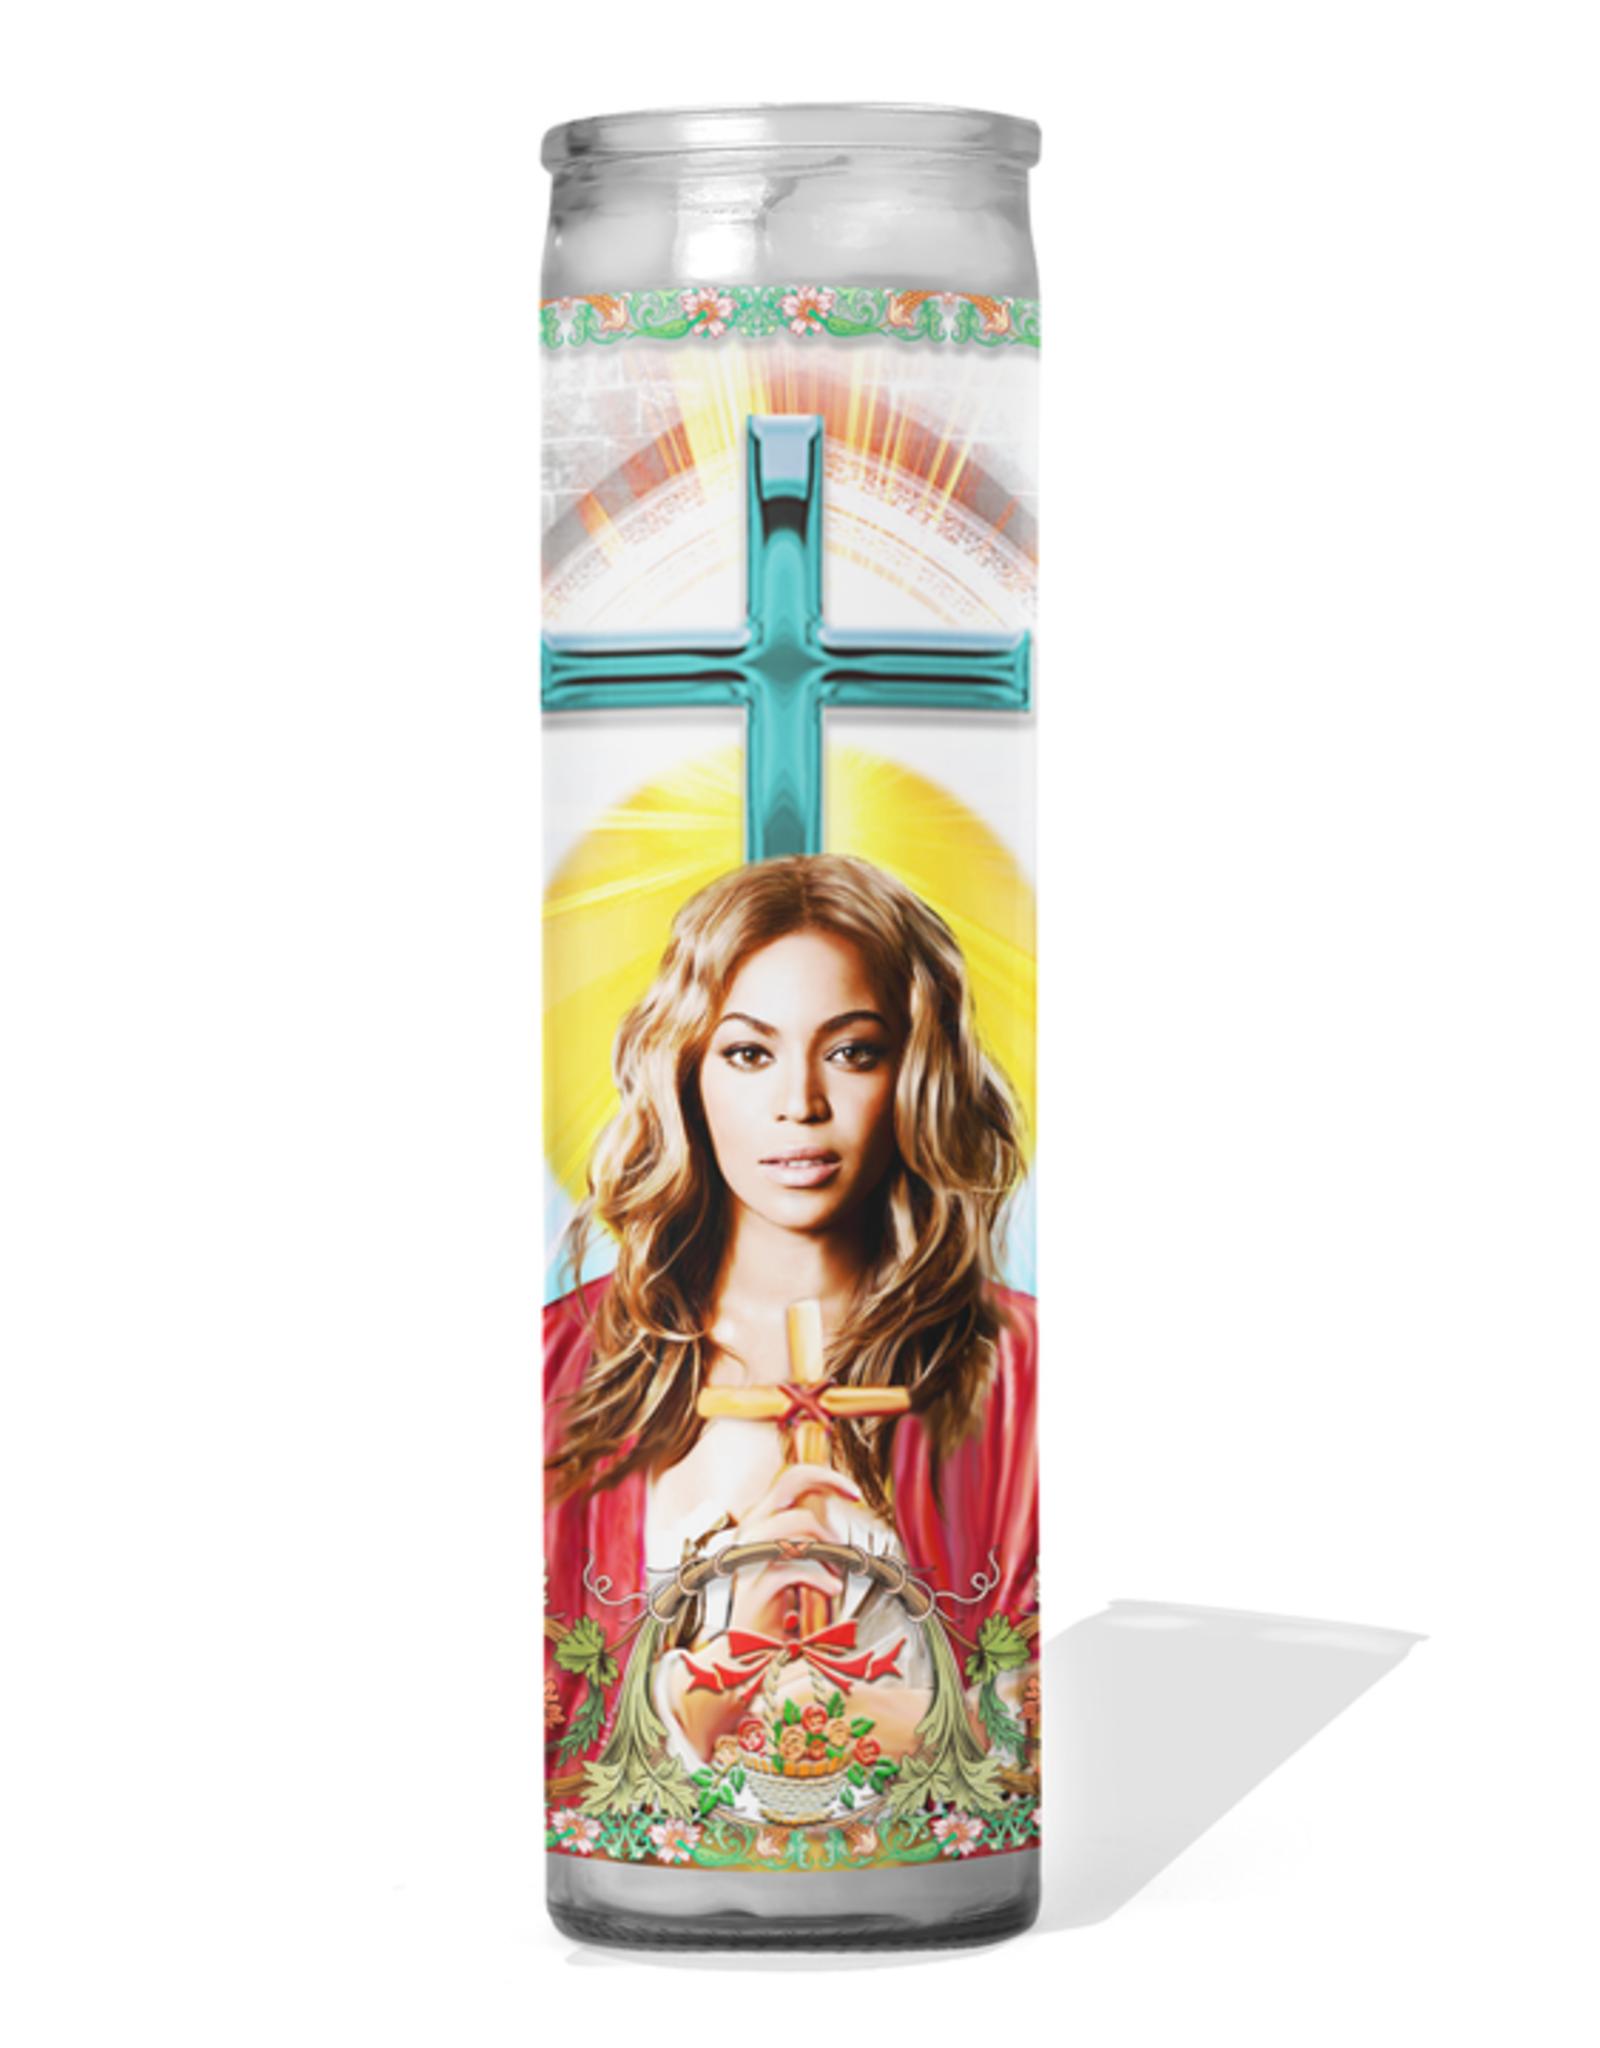 Calm Down Caren Beyonce Prayer Candle